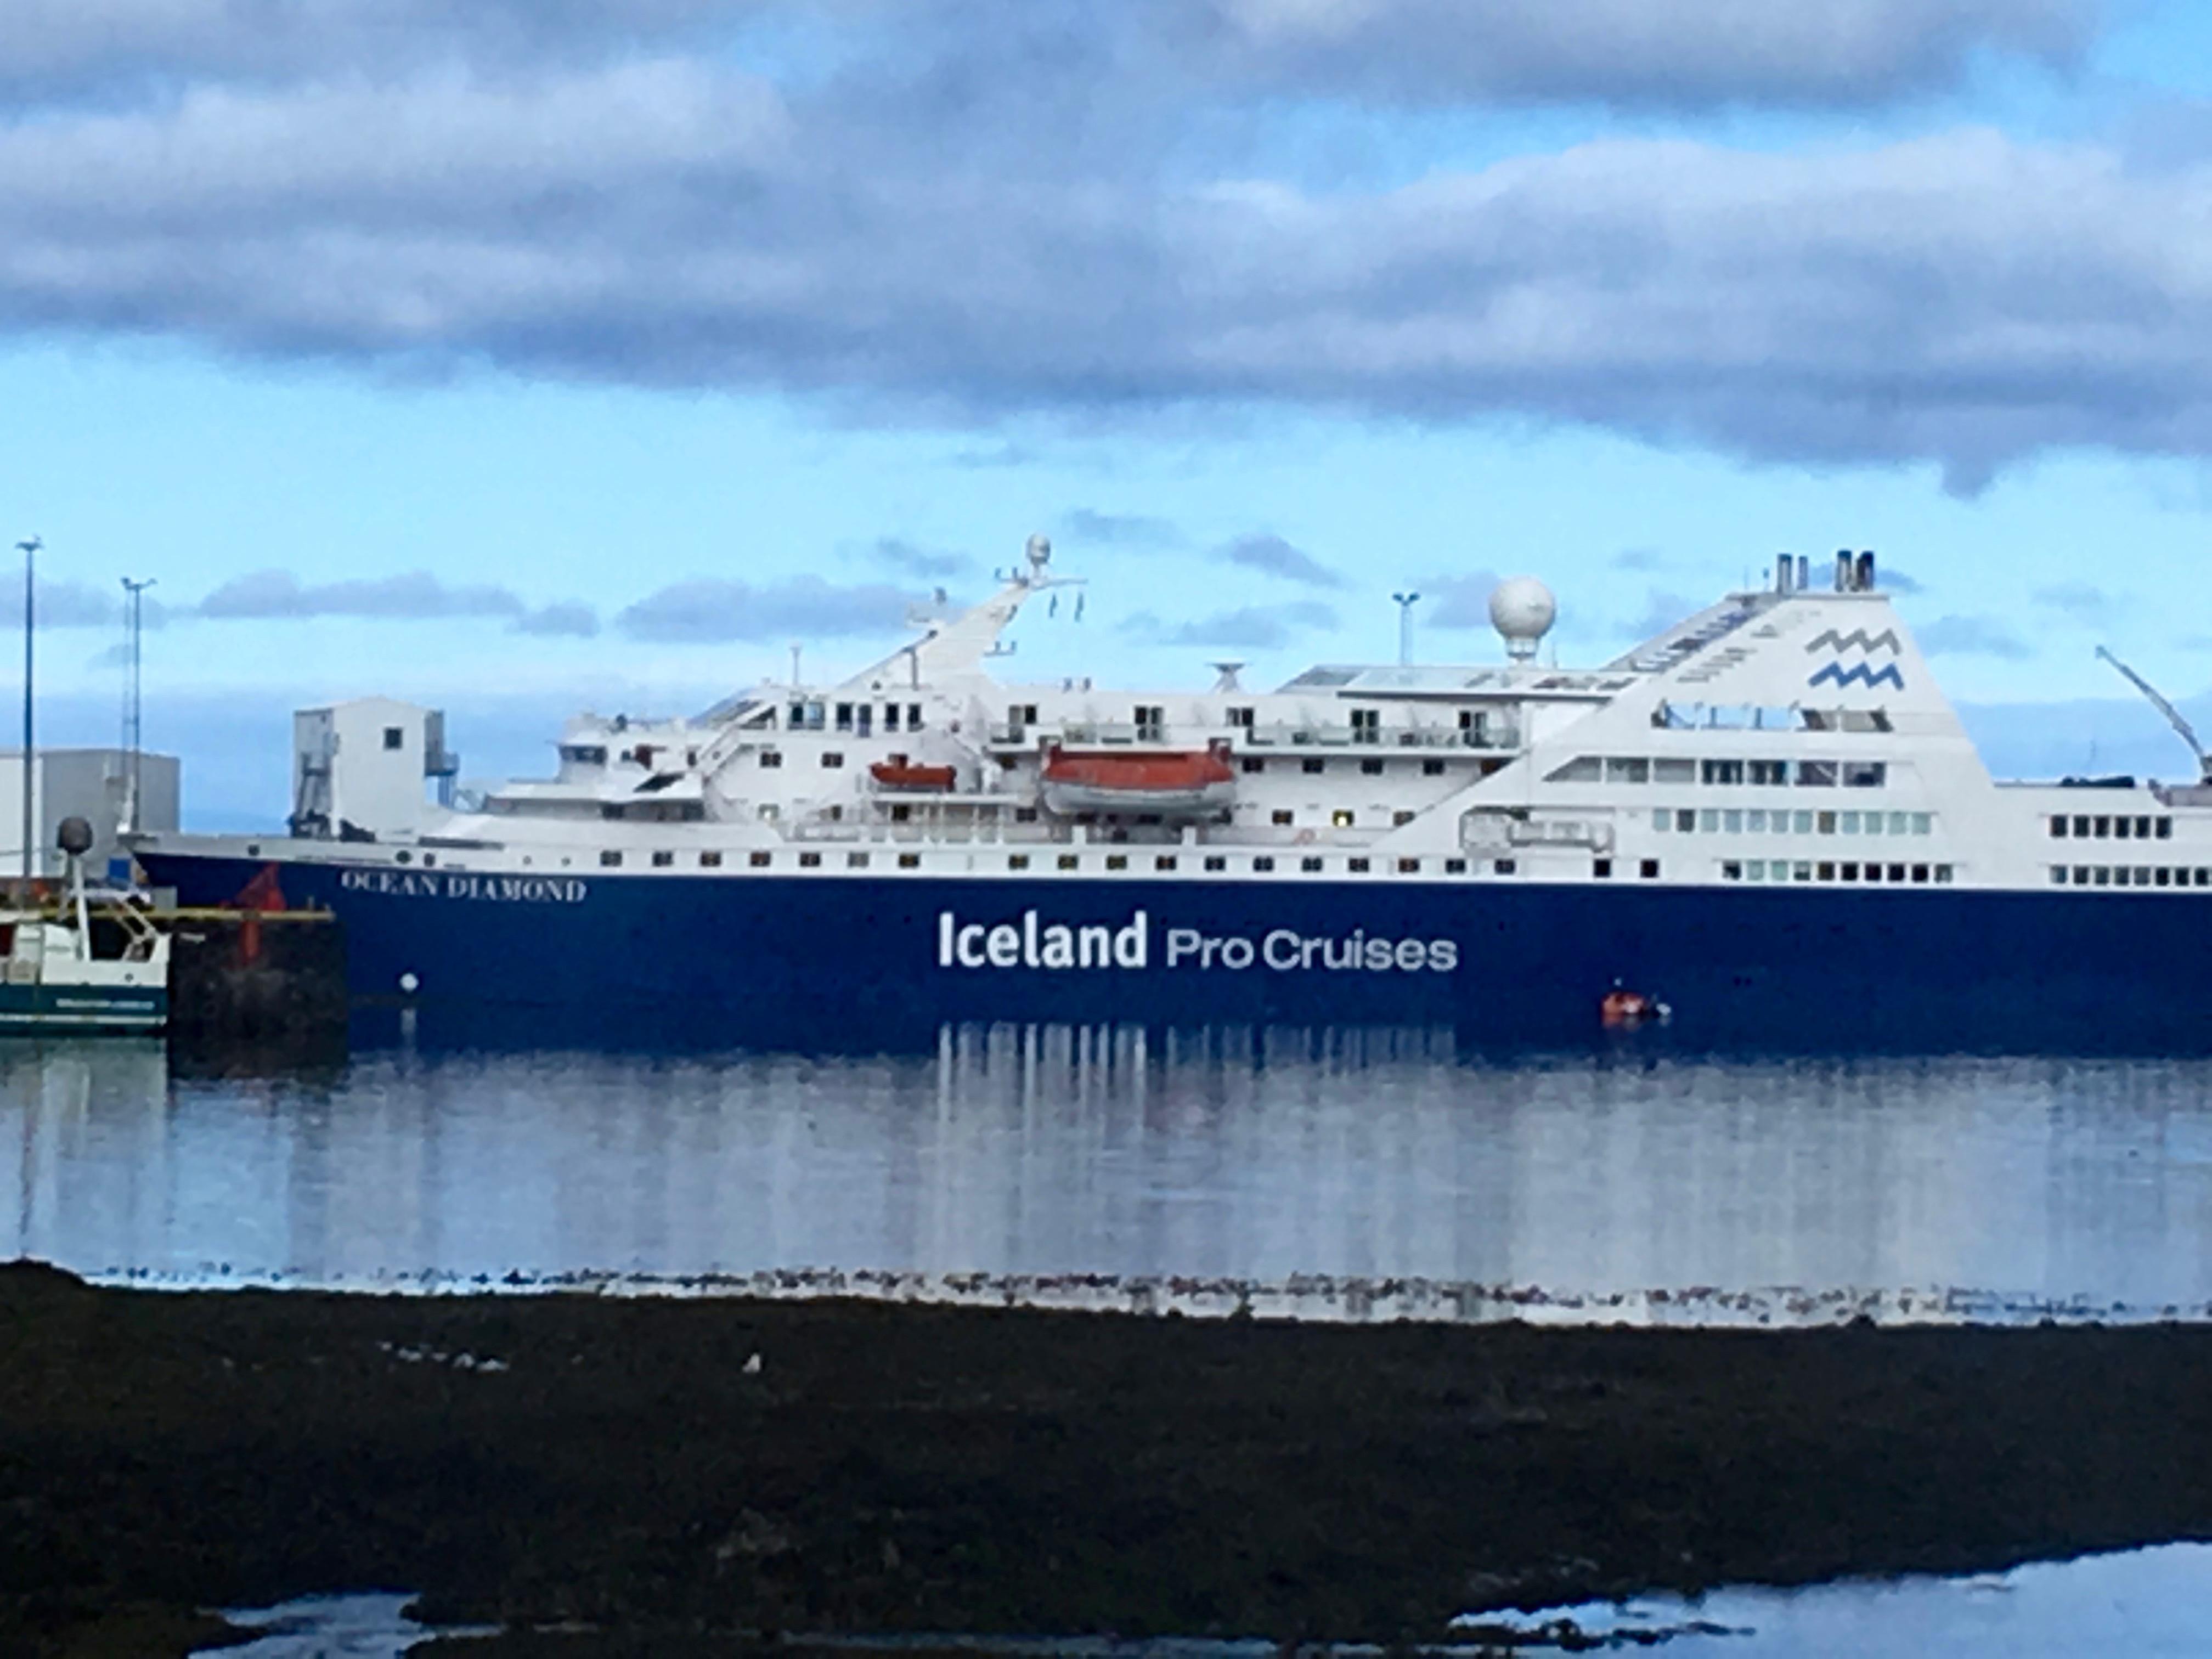 Our ProCruises Ocean Diamond ship. Photo: Tonya Fitzpatrick